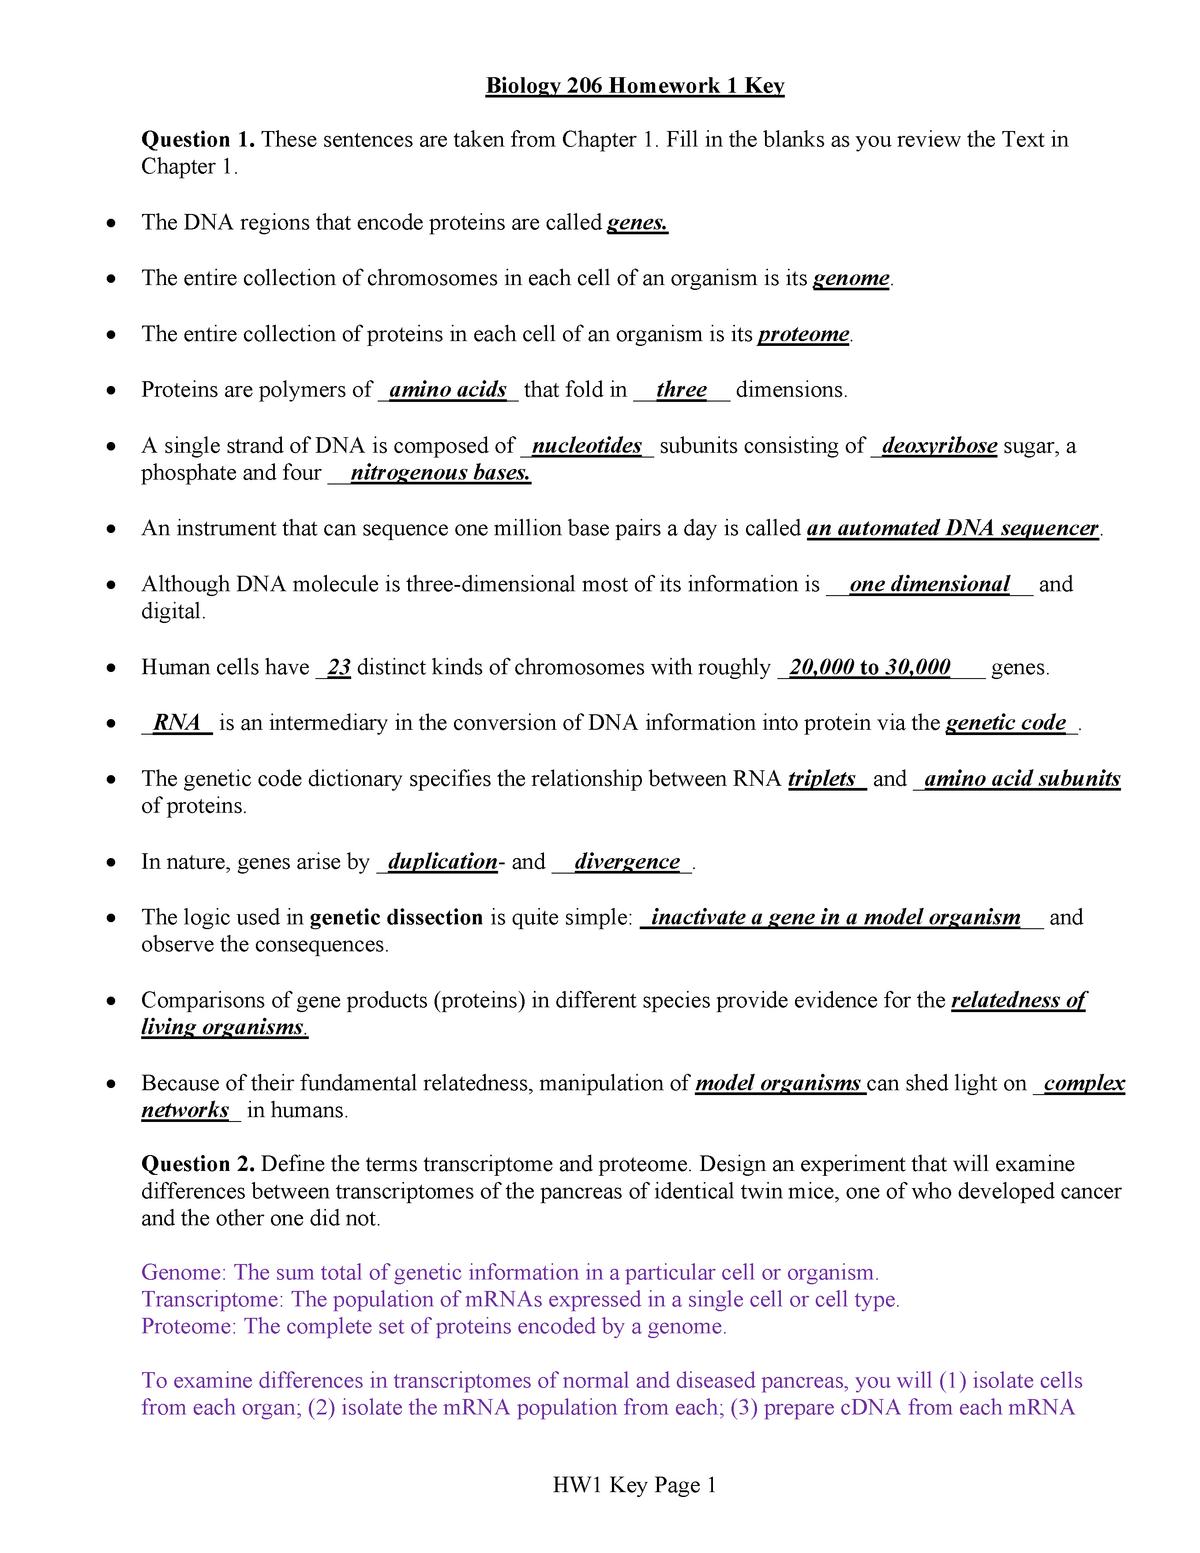 Homework number 1 key - BIO 20600 Introduction To Genetics